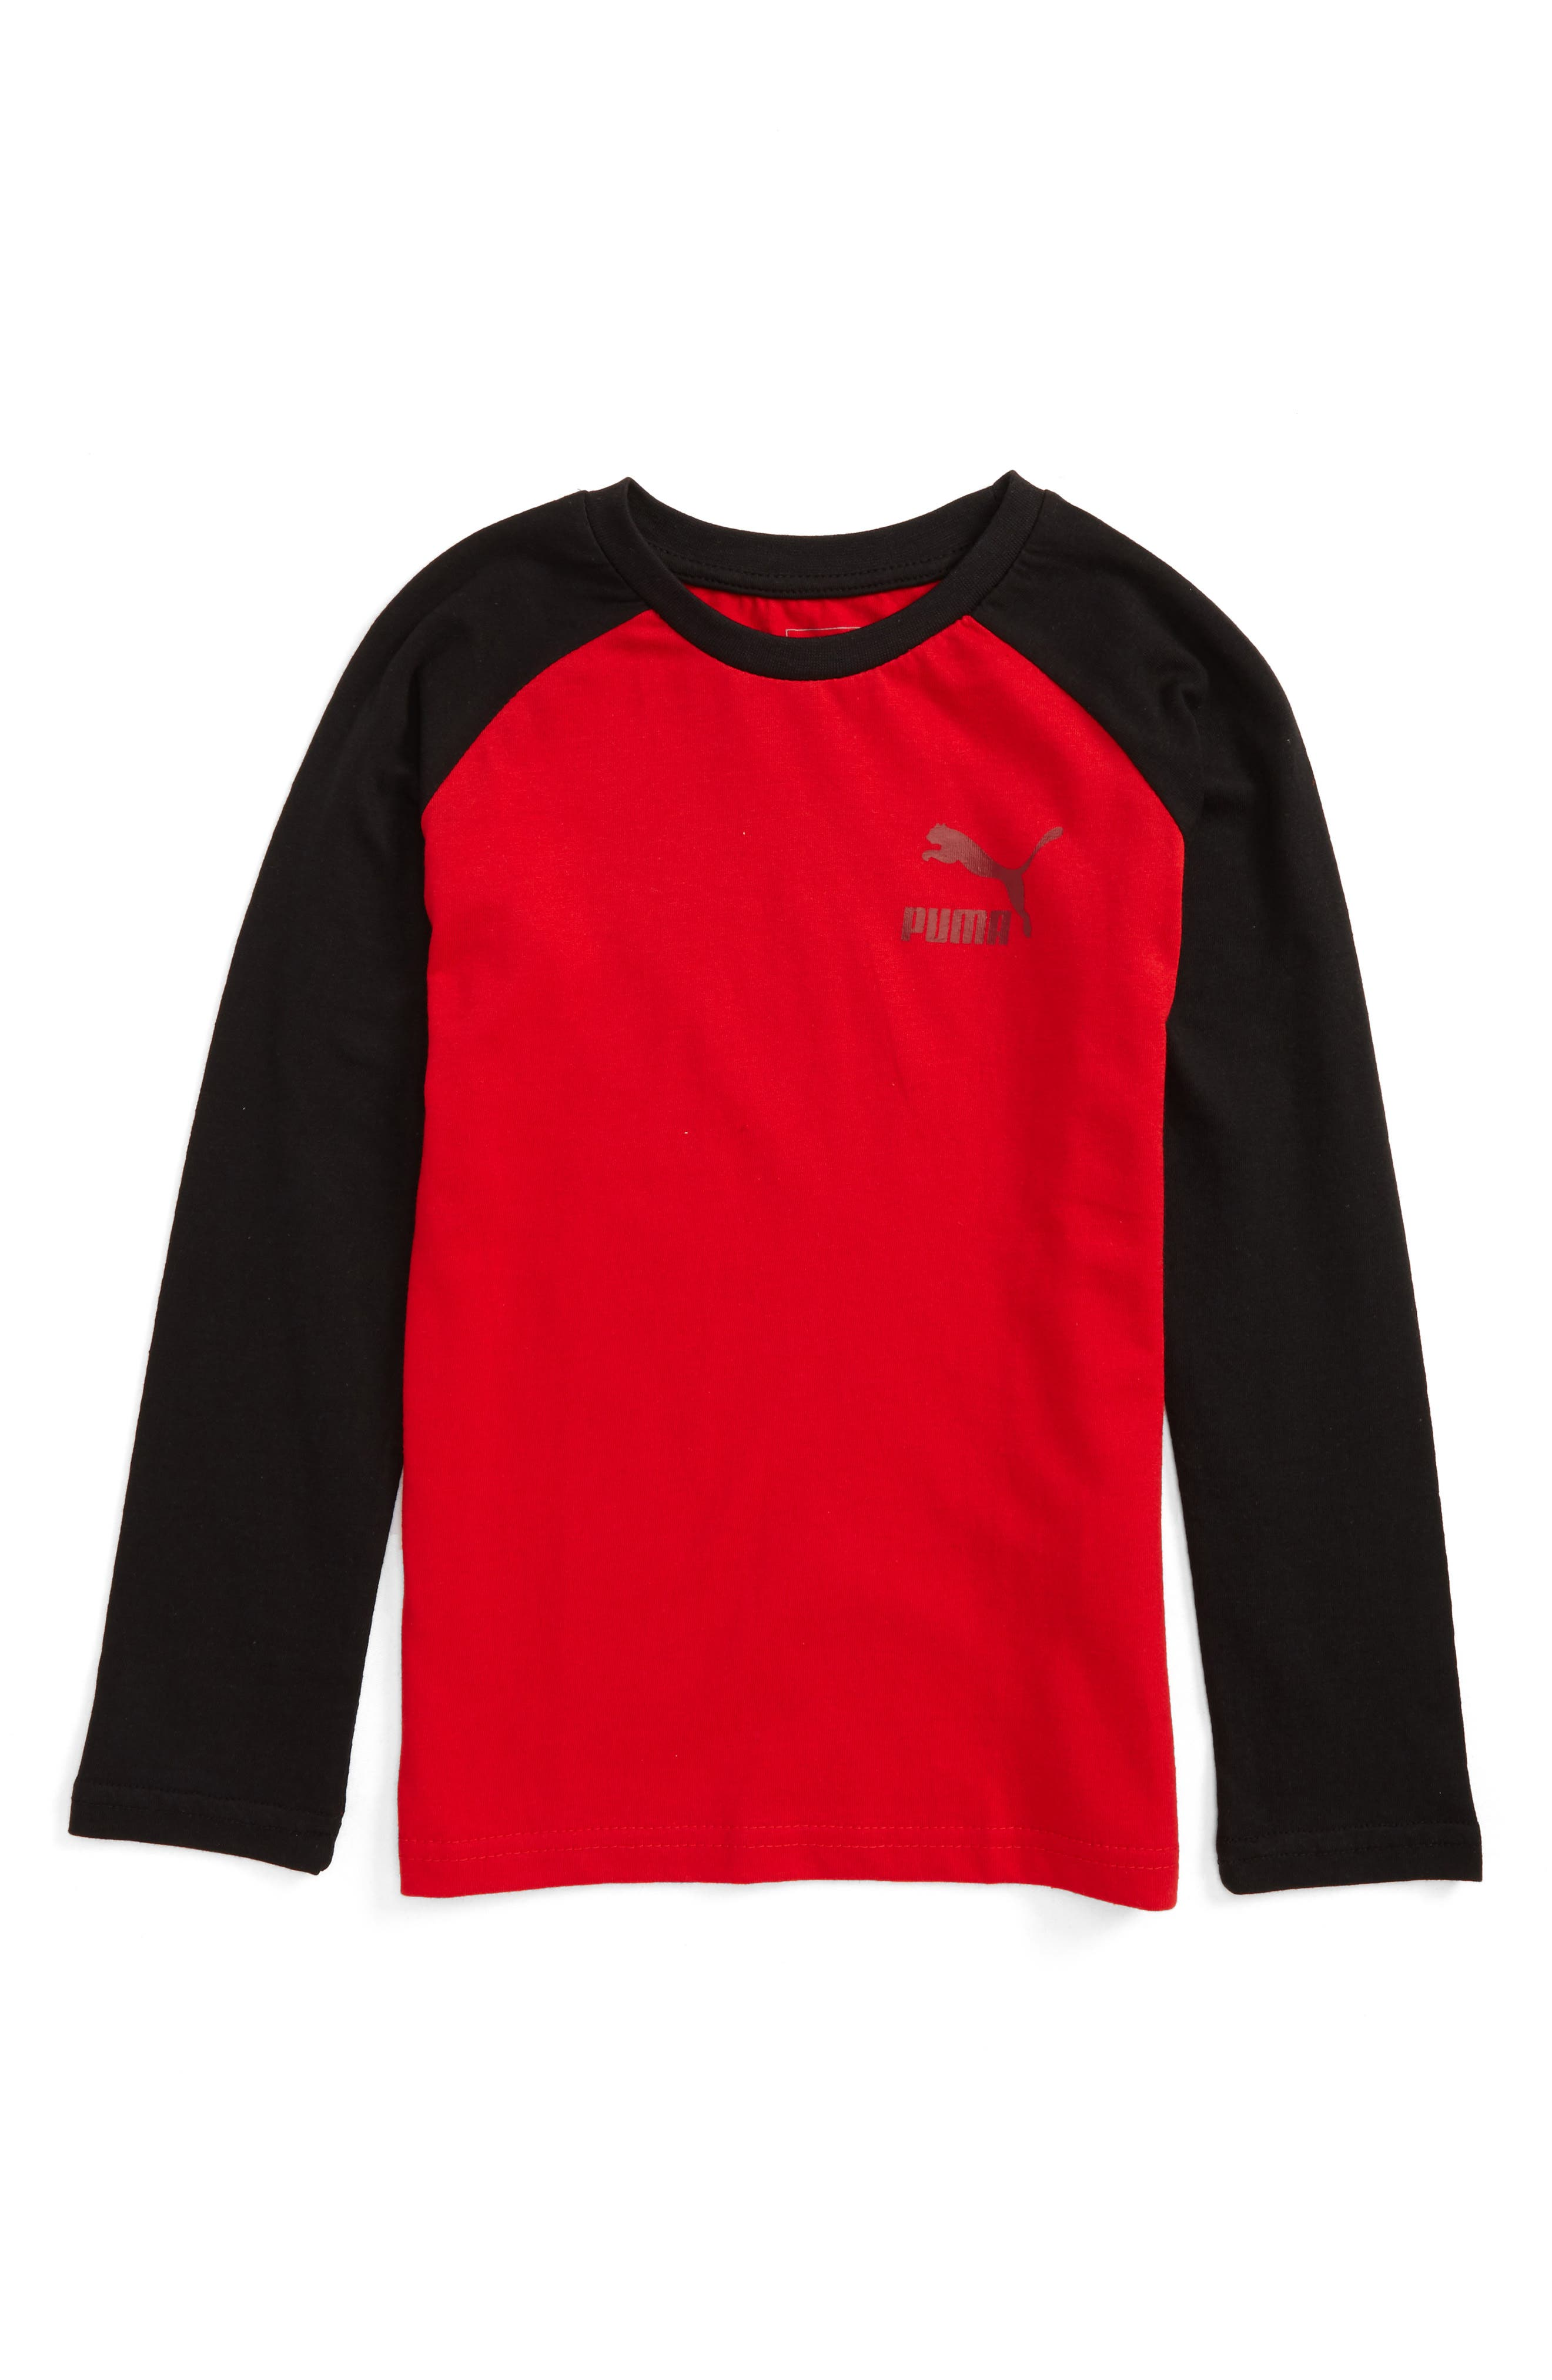 PUMA Logo Raglan Sleeve T-Shirt (Little Boys)